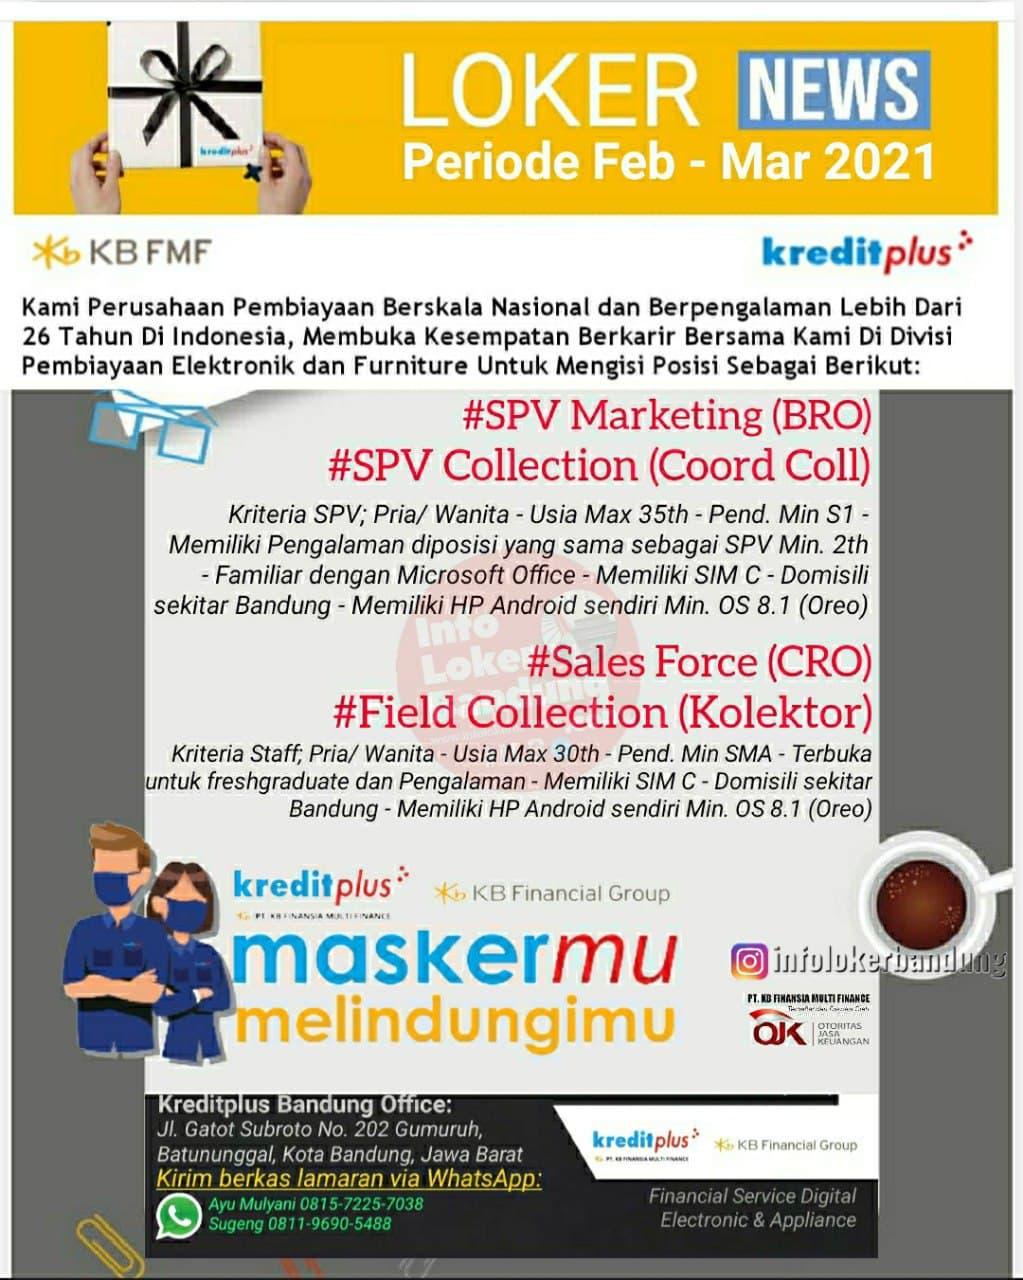 Lowongan Kerja Kreditplus Bandung Februari 2021